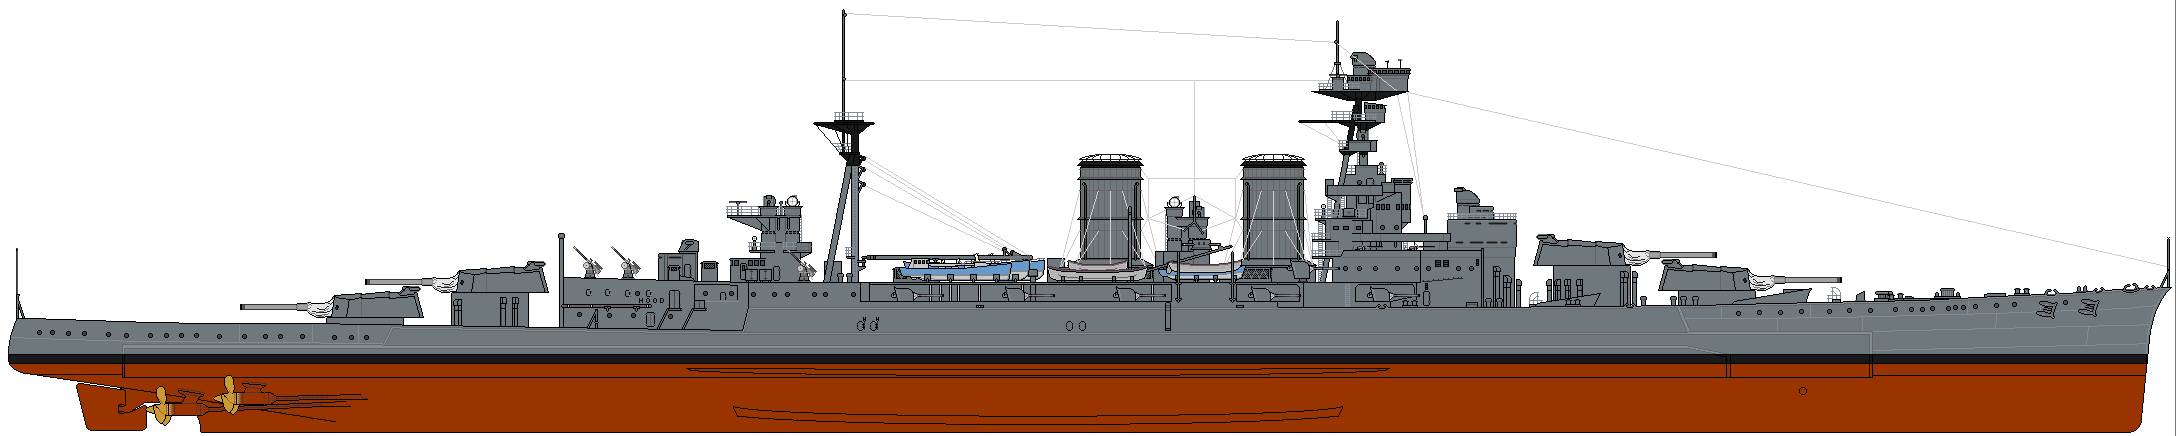 HMS_Hood_(1921)_profile_drawing.png